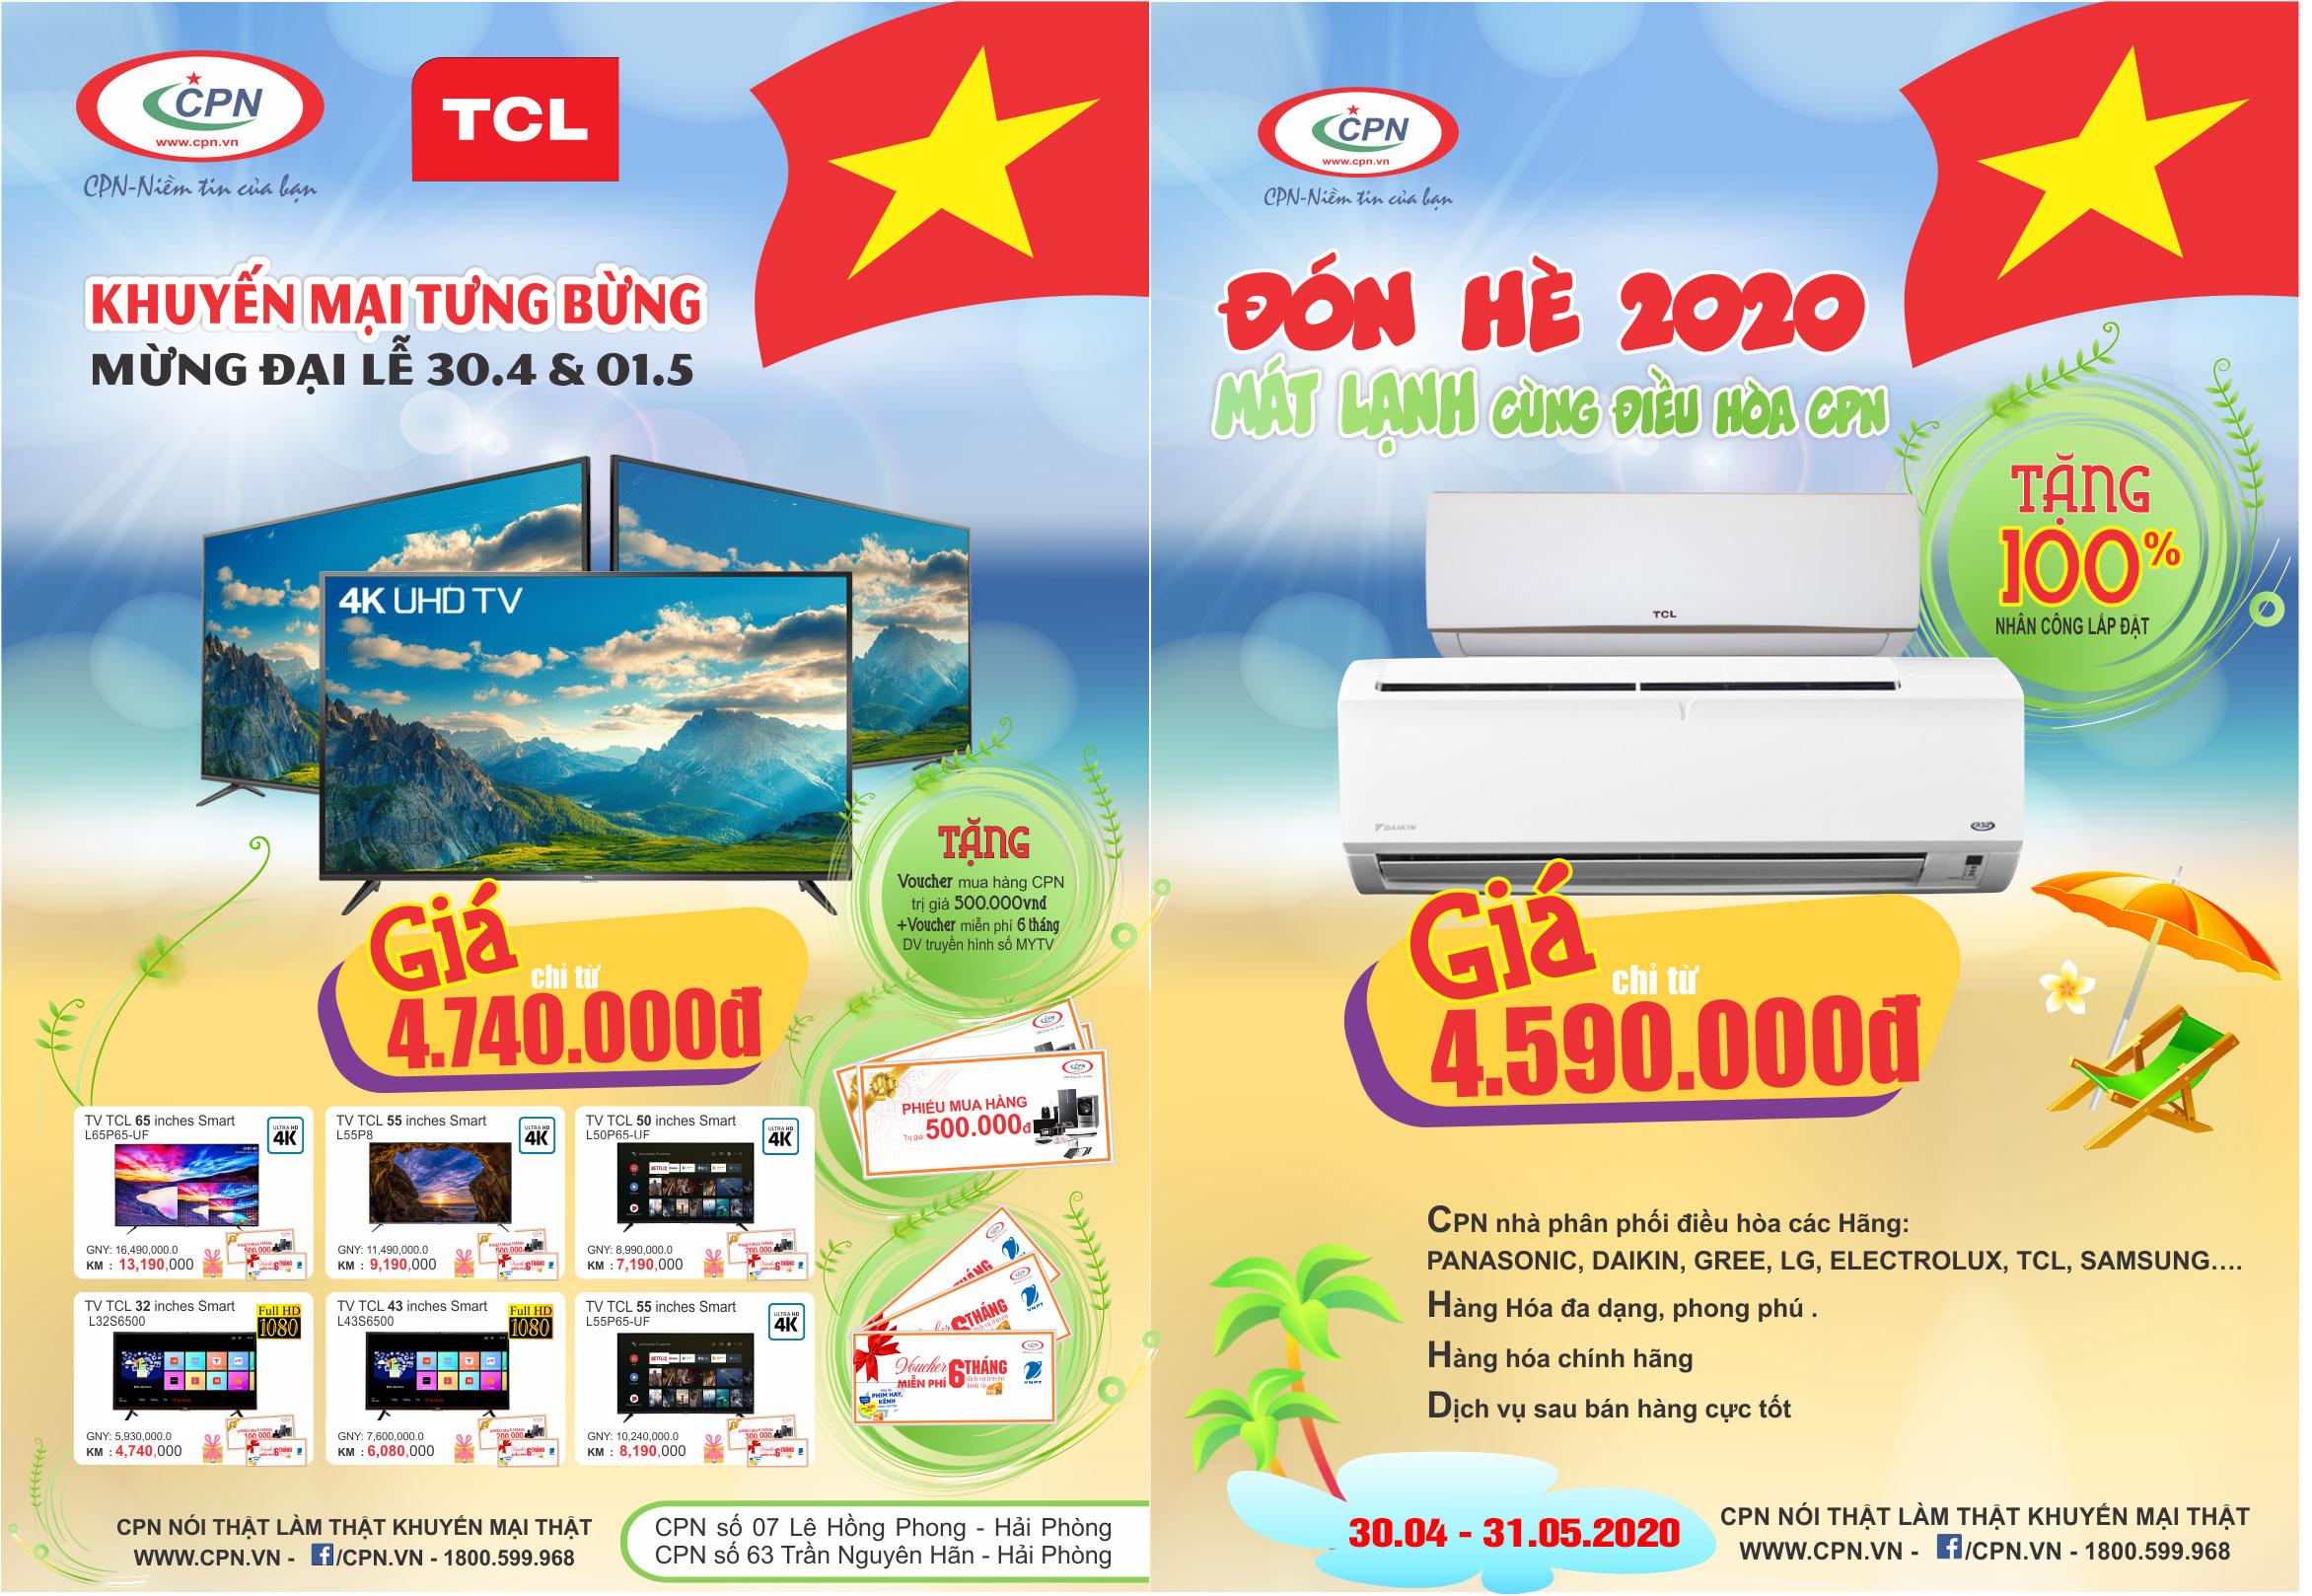 toroi-tcl-042020.jpg